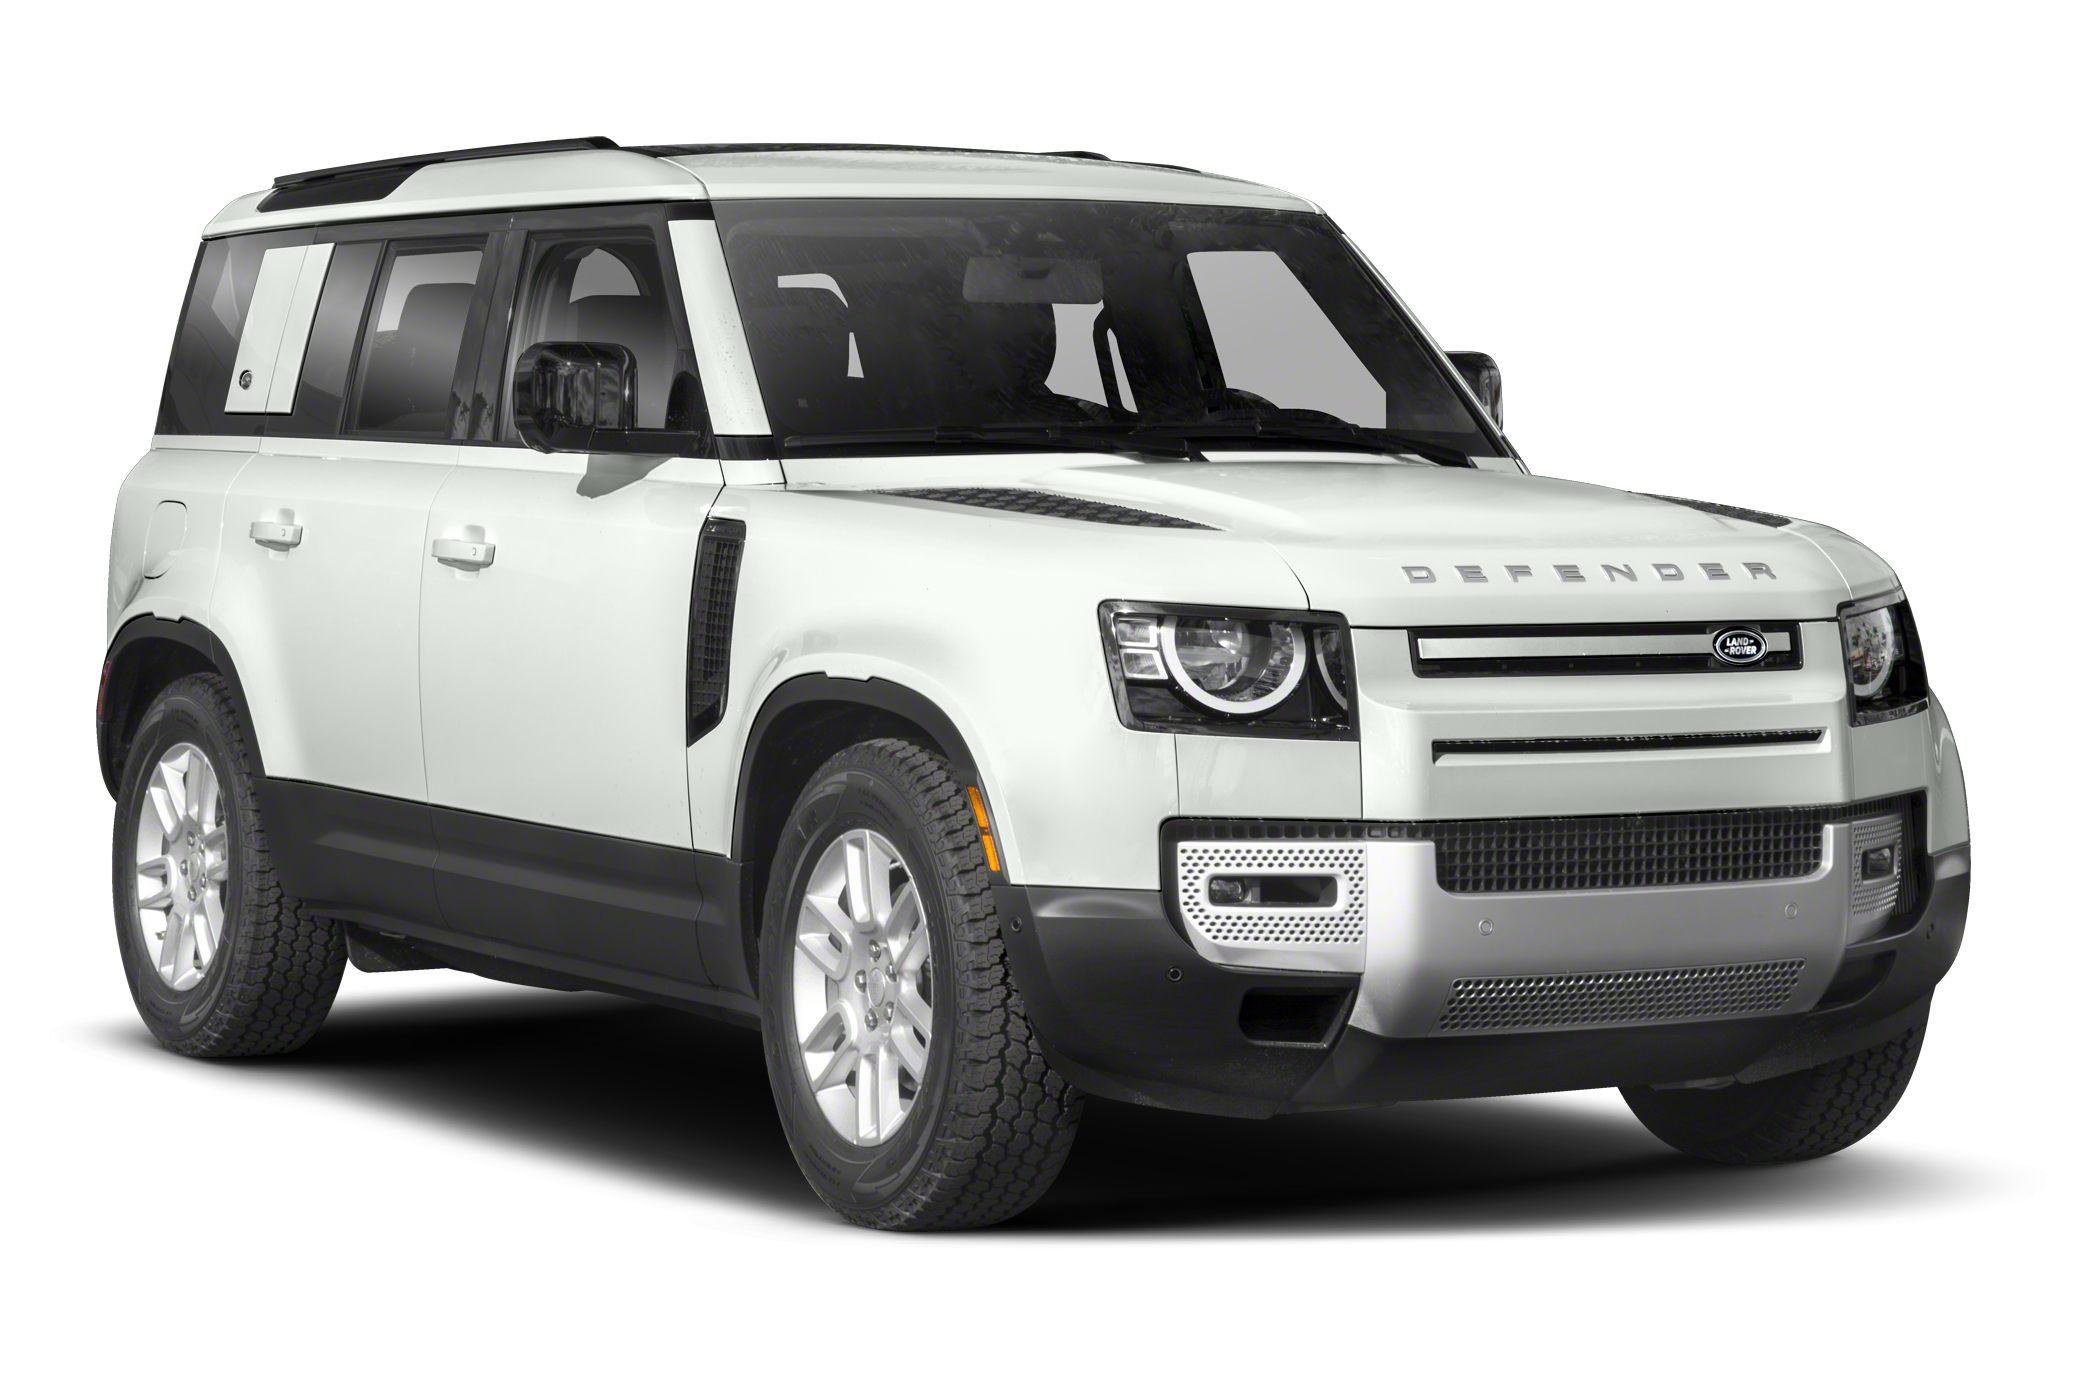 2021 Land Rover Defender MPG, Price, Reviews & Photos ...